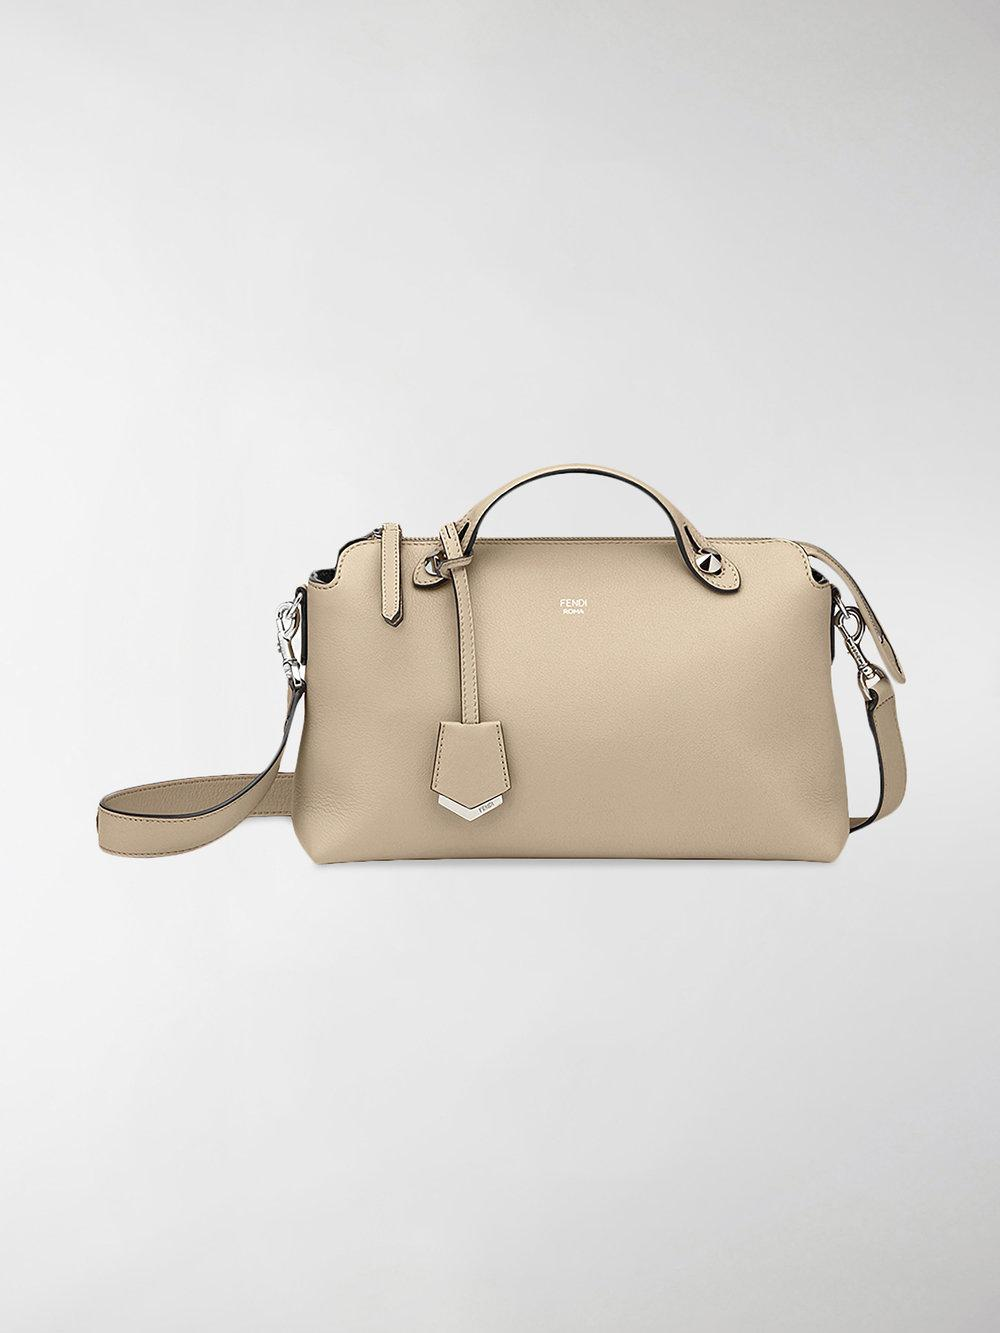 752da25cd929 Lyst - Fendi By The Way Shoulder Bag in Natural